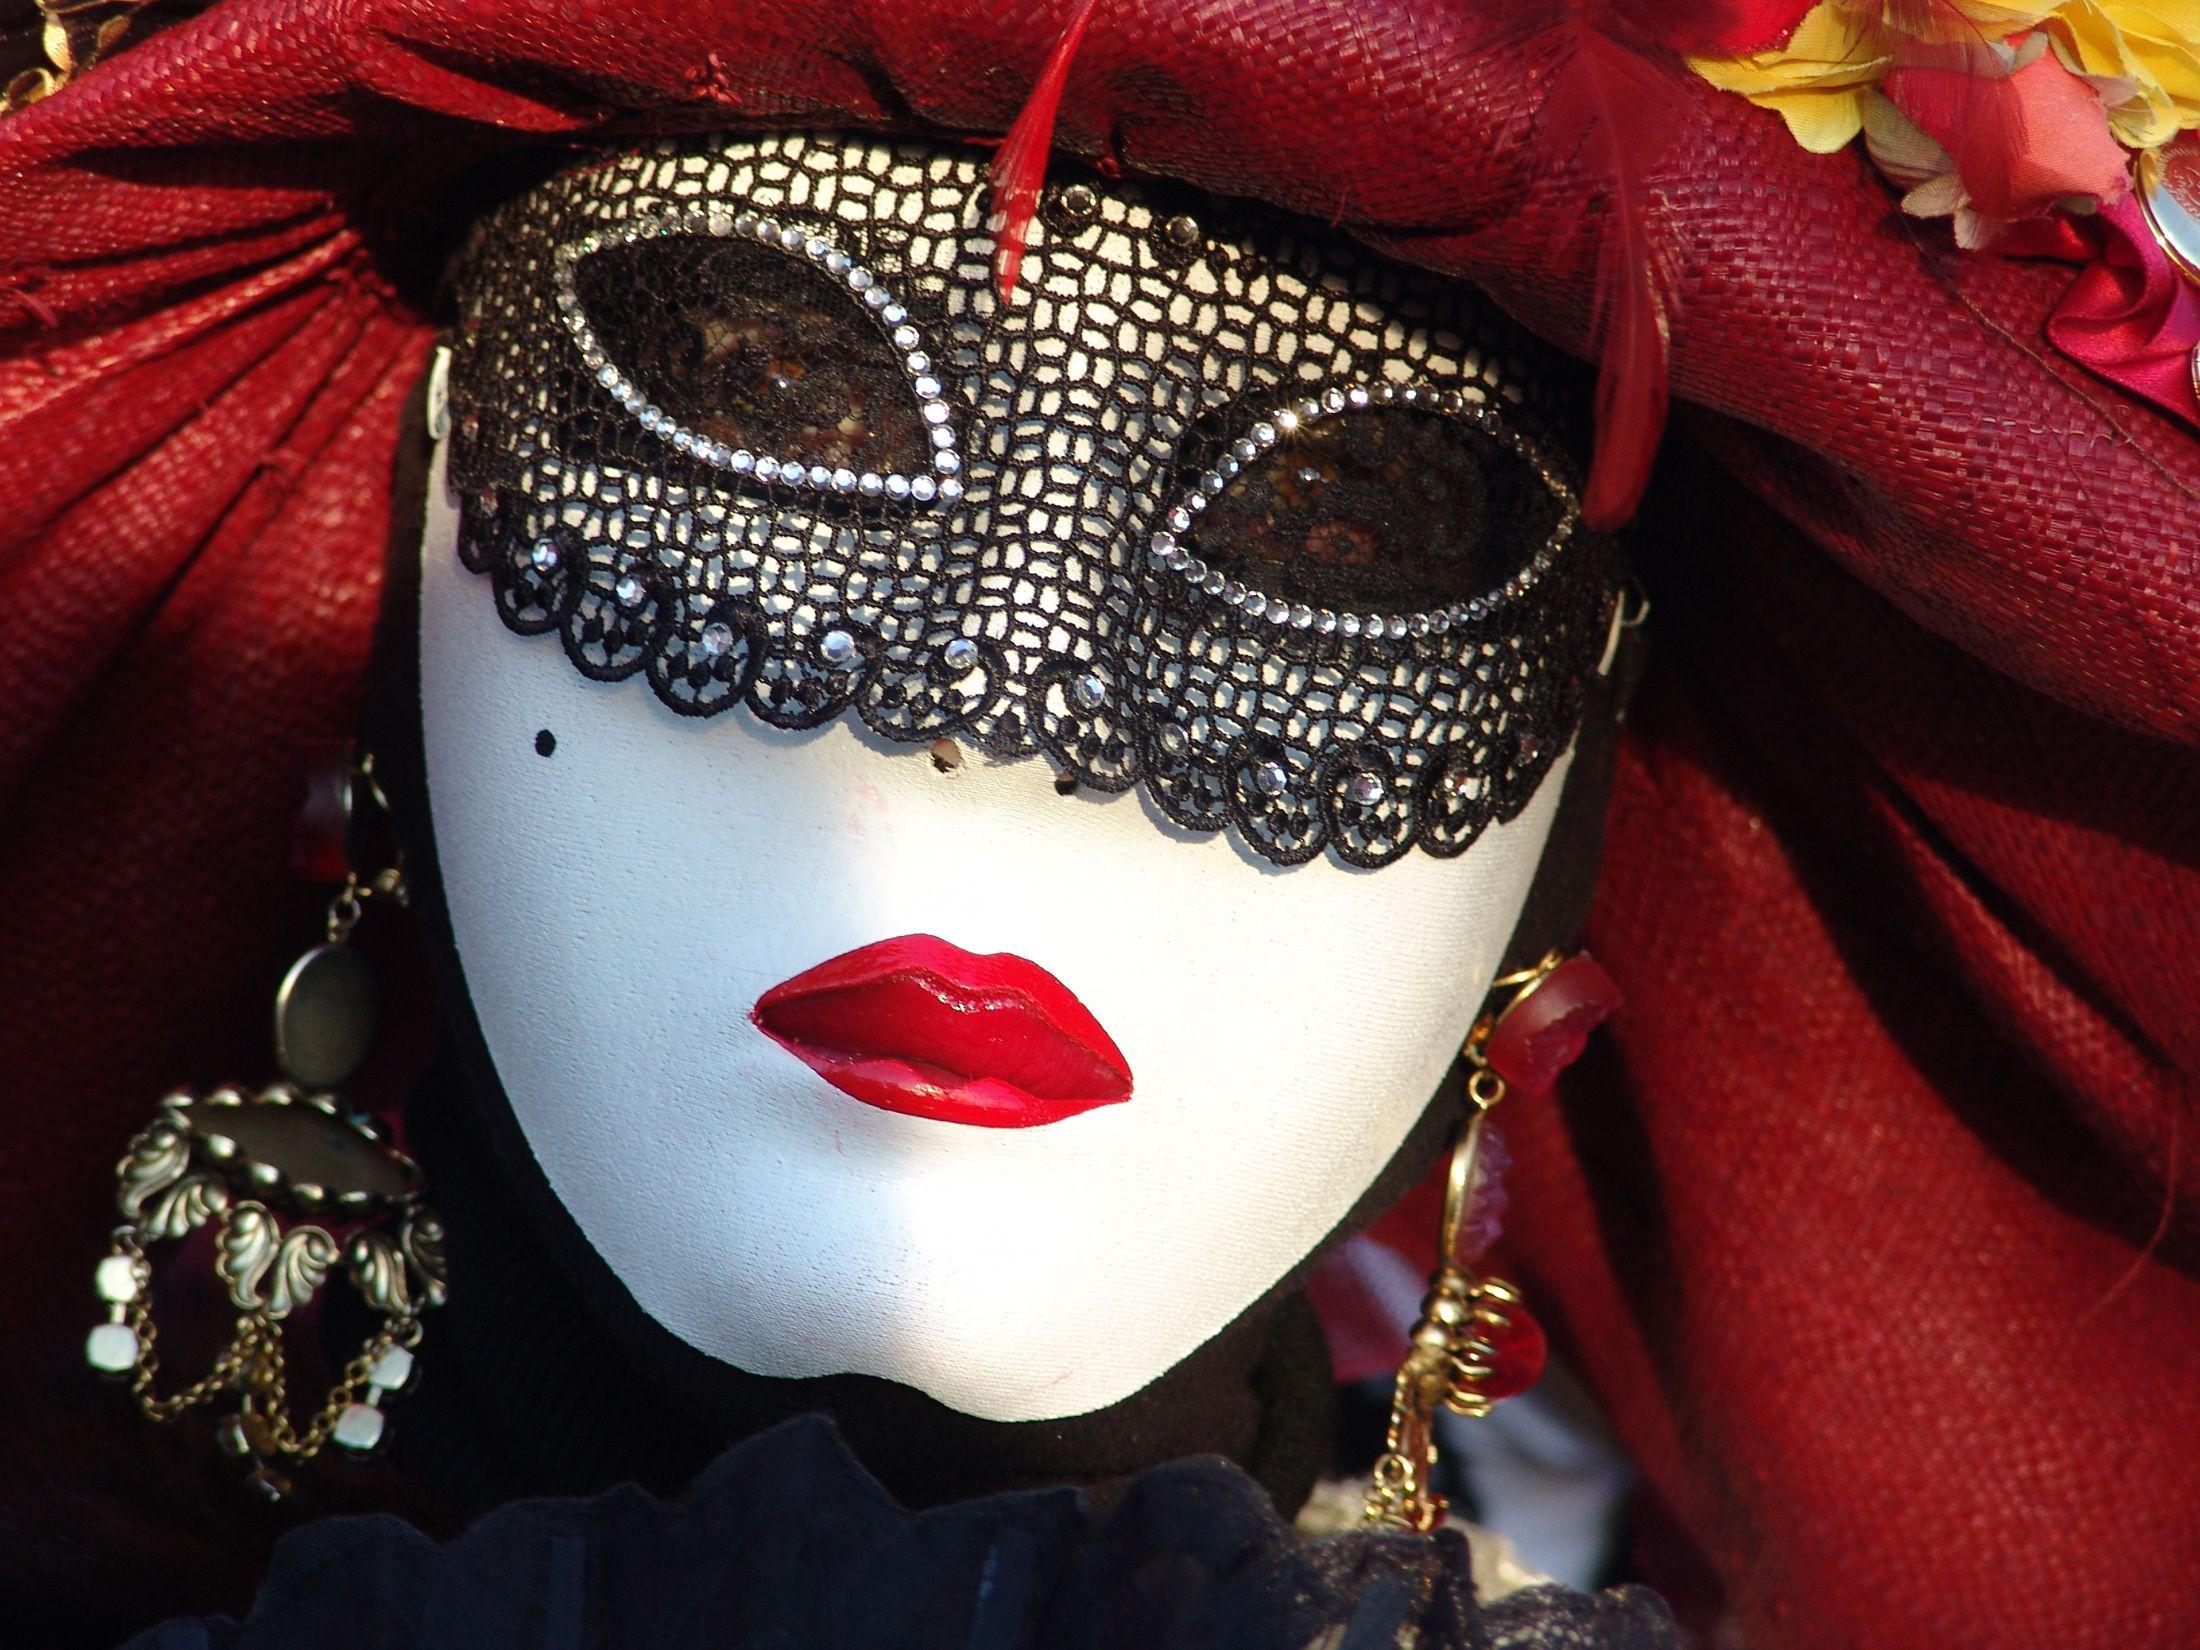 best images about MASQUERADE MASKS on Pinterest Eye masks